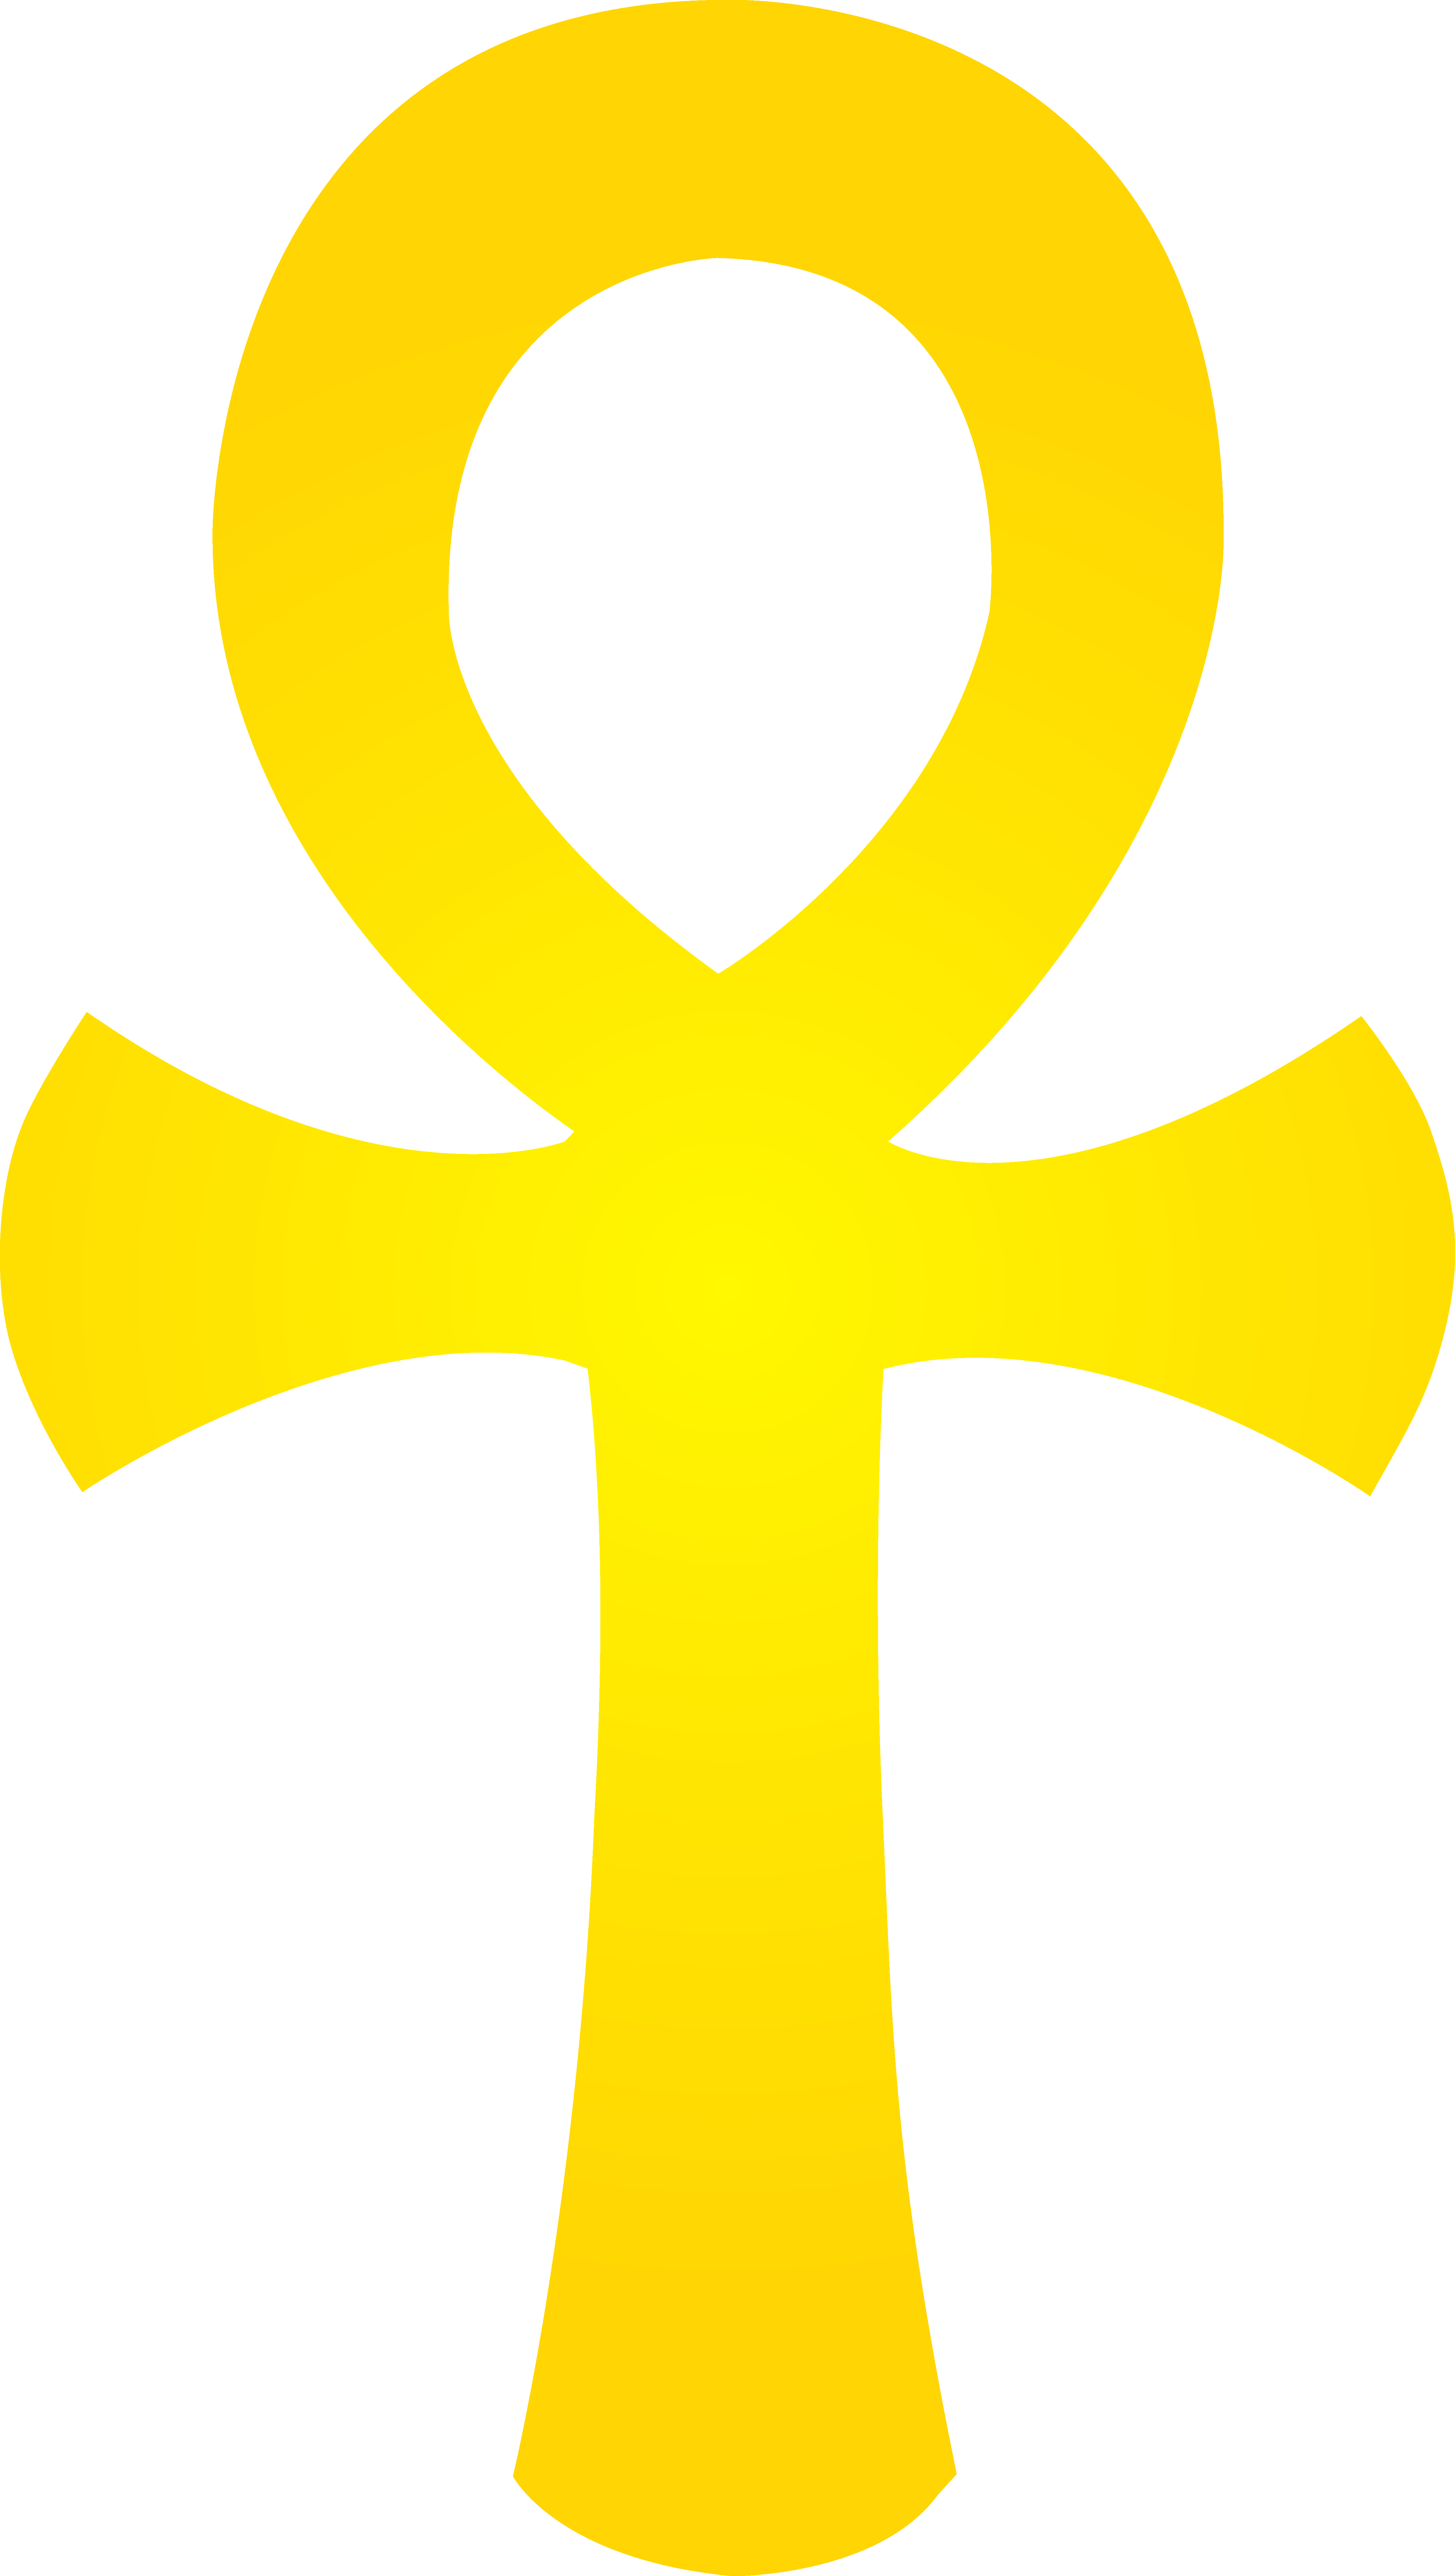 Egypt sun clipart graphic freeuse stock Golden Egyptian Ankh Symbol - Free Clip Art graphic freeuse stock